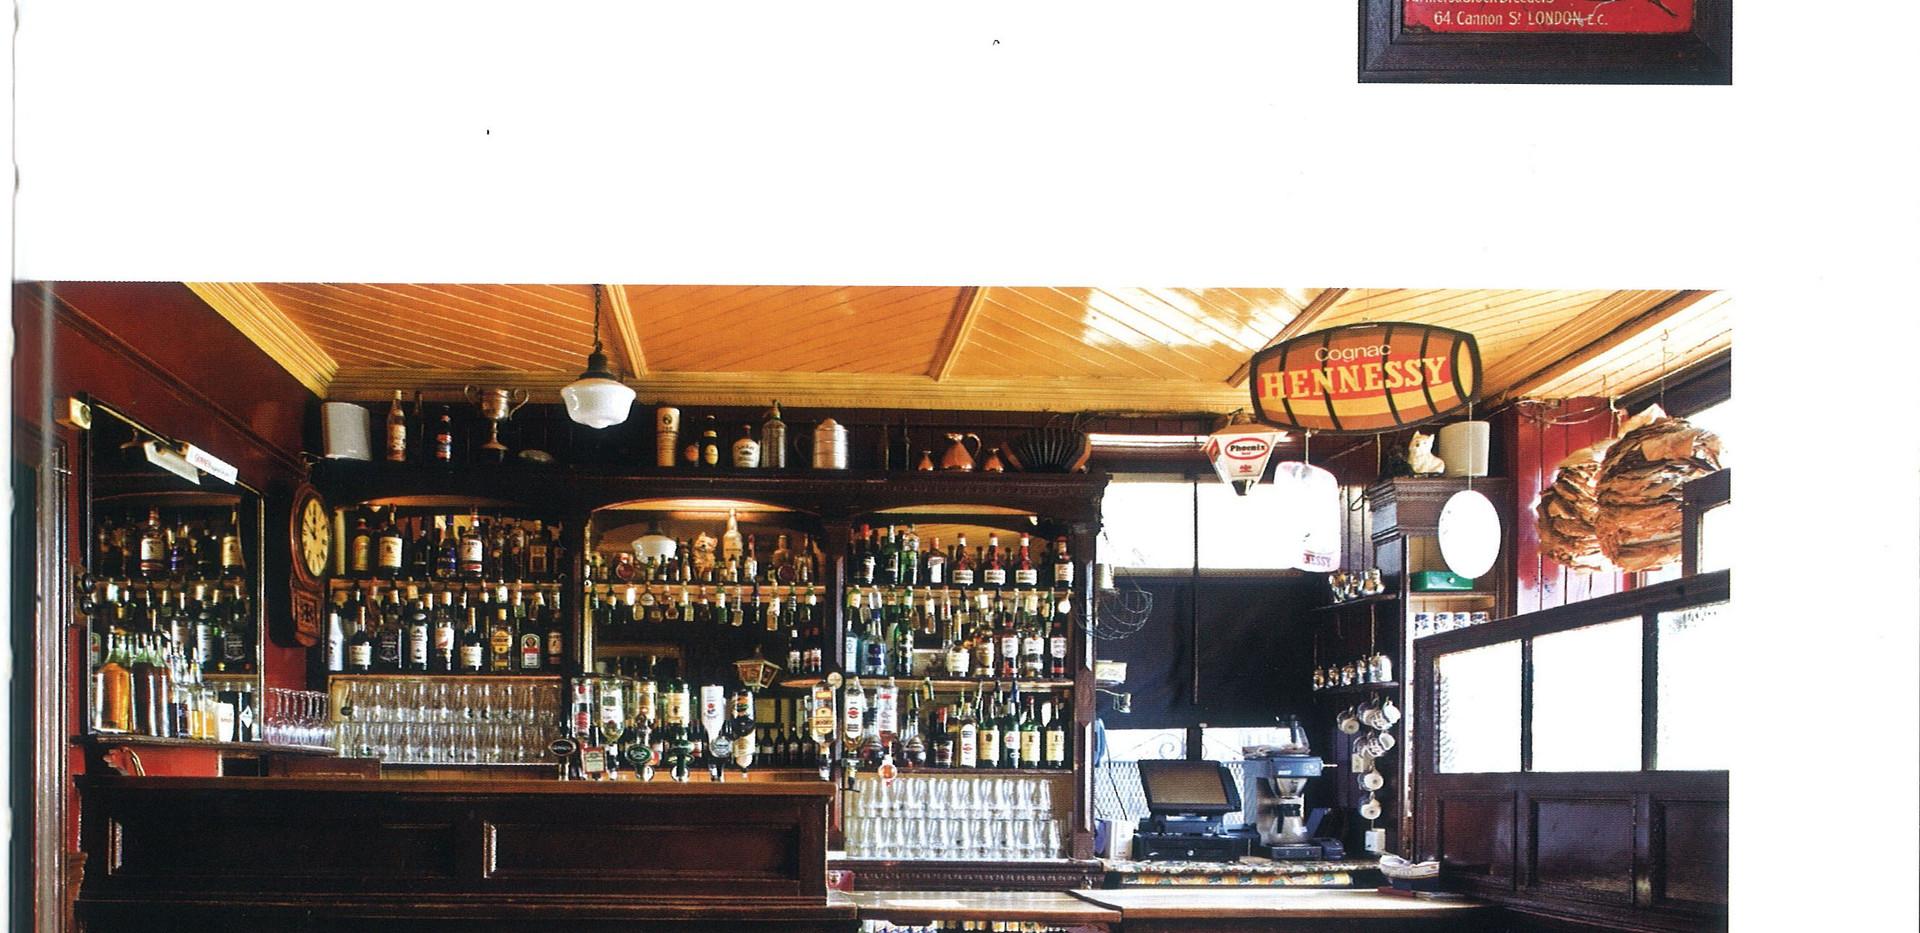 Crotty's, The Irish Pub, Thames & Hudson